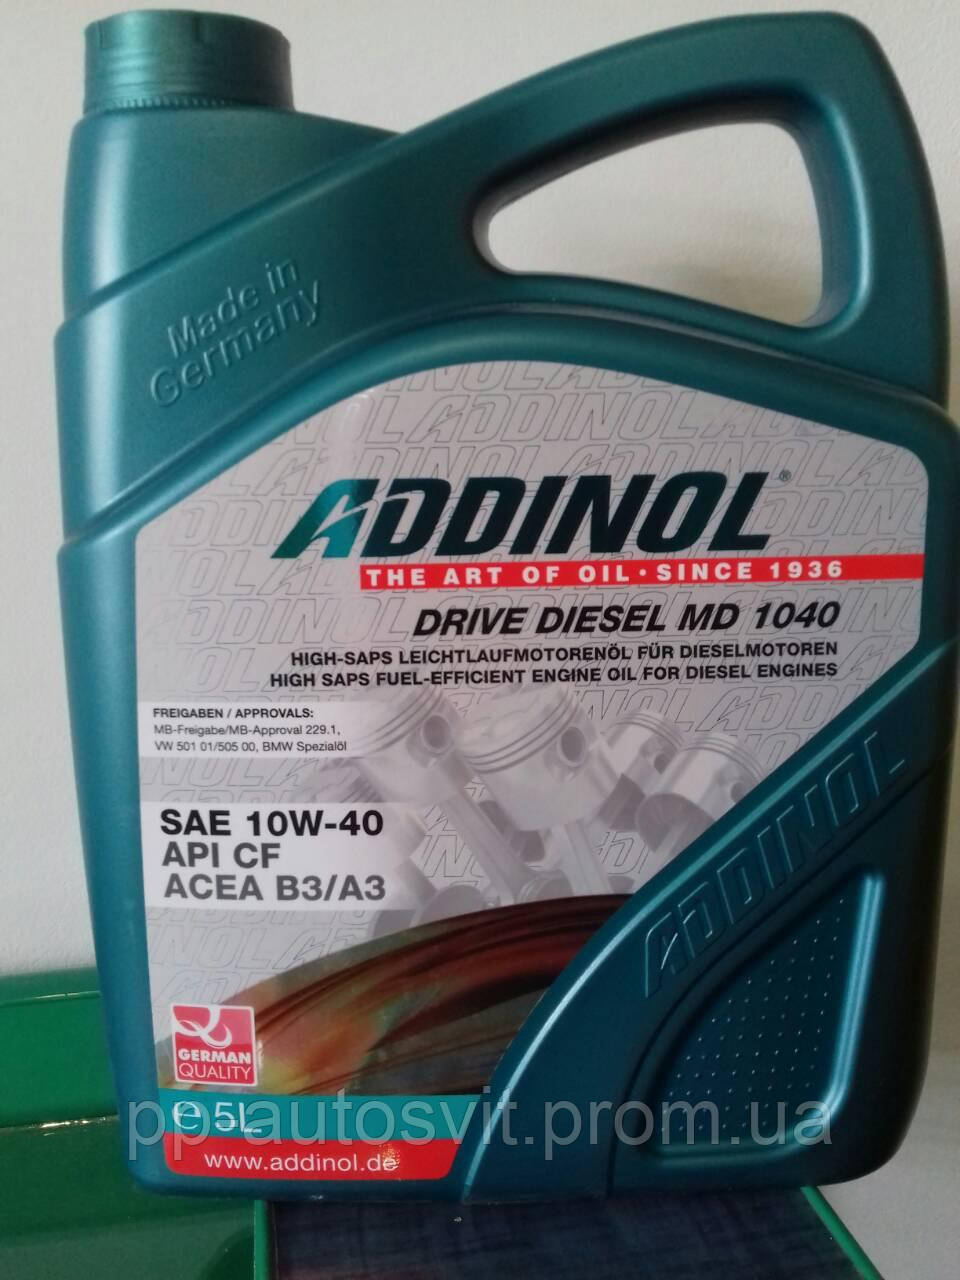 Масло моторное Addinol 10W40 Drive Diesel MD 1040 5л - AUTOSVIT в Ивано-Франковской области